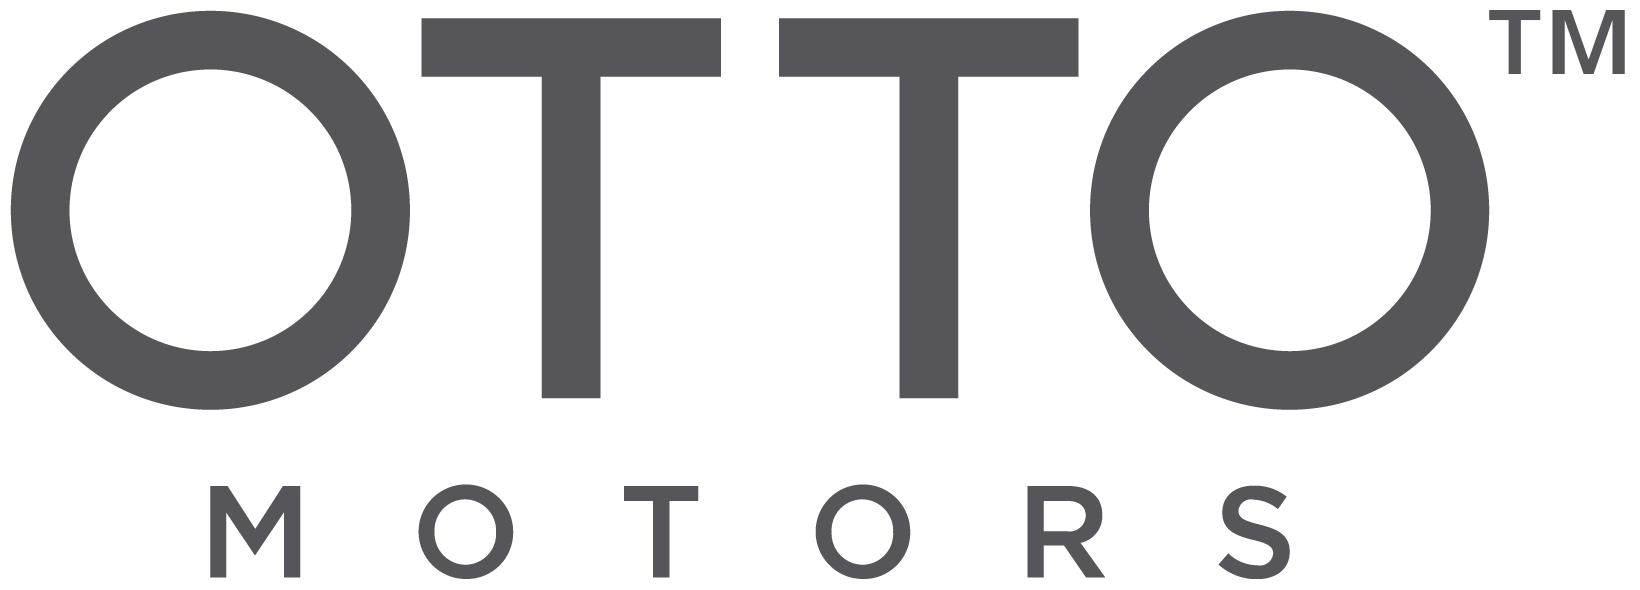 otto-motors-logo_dark.png